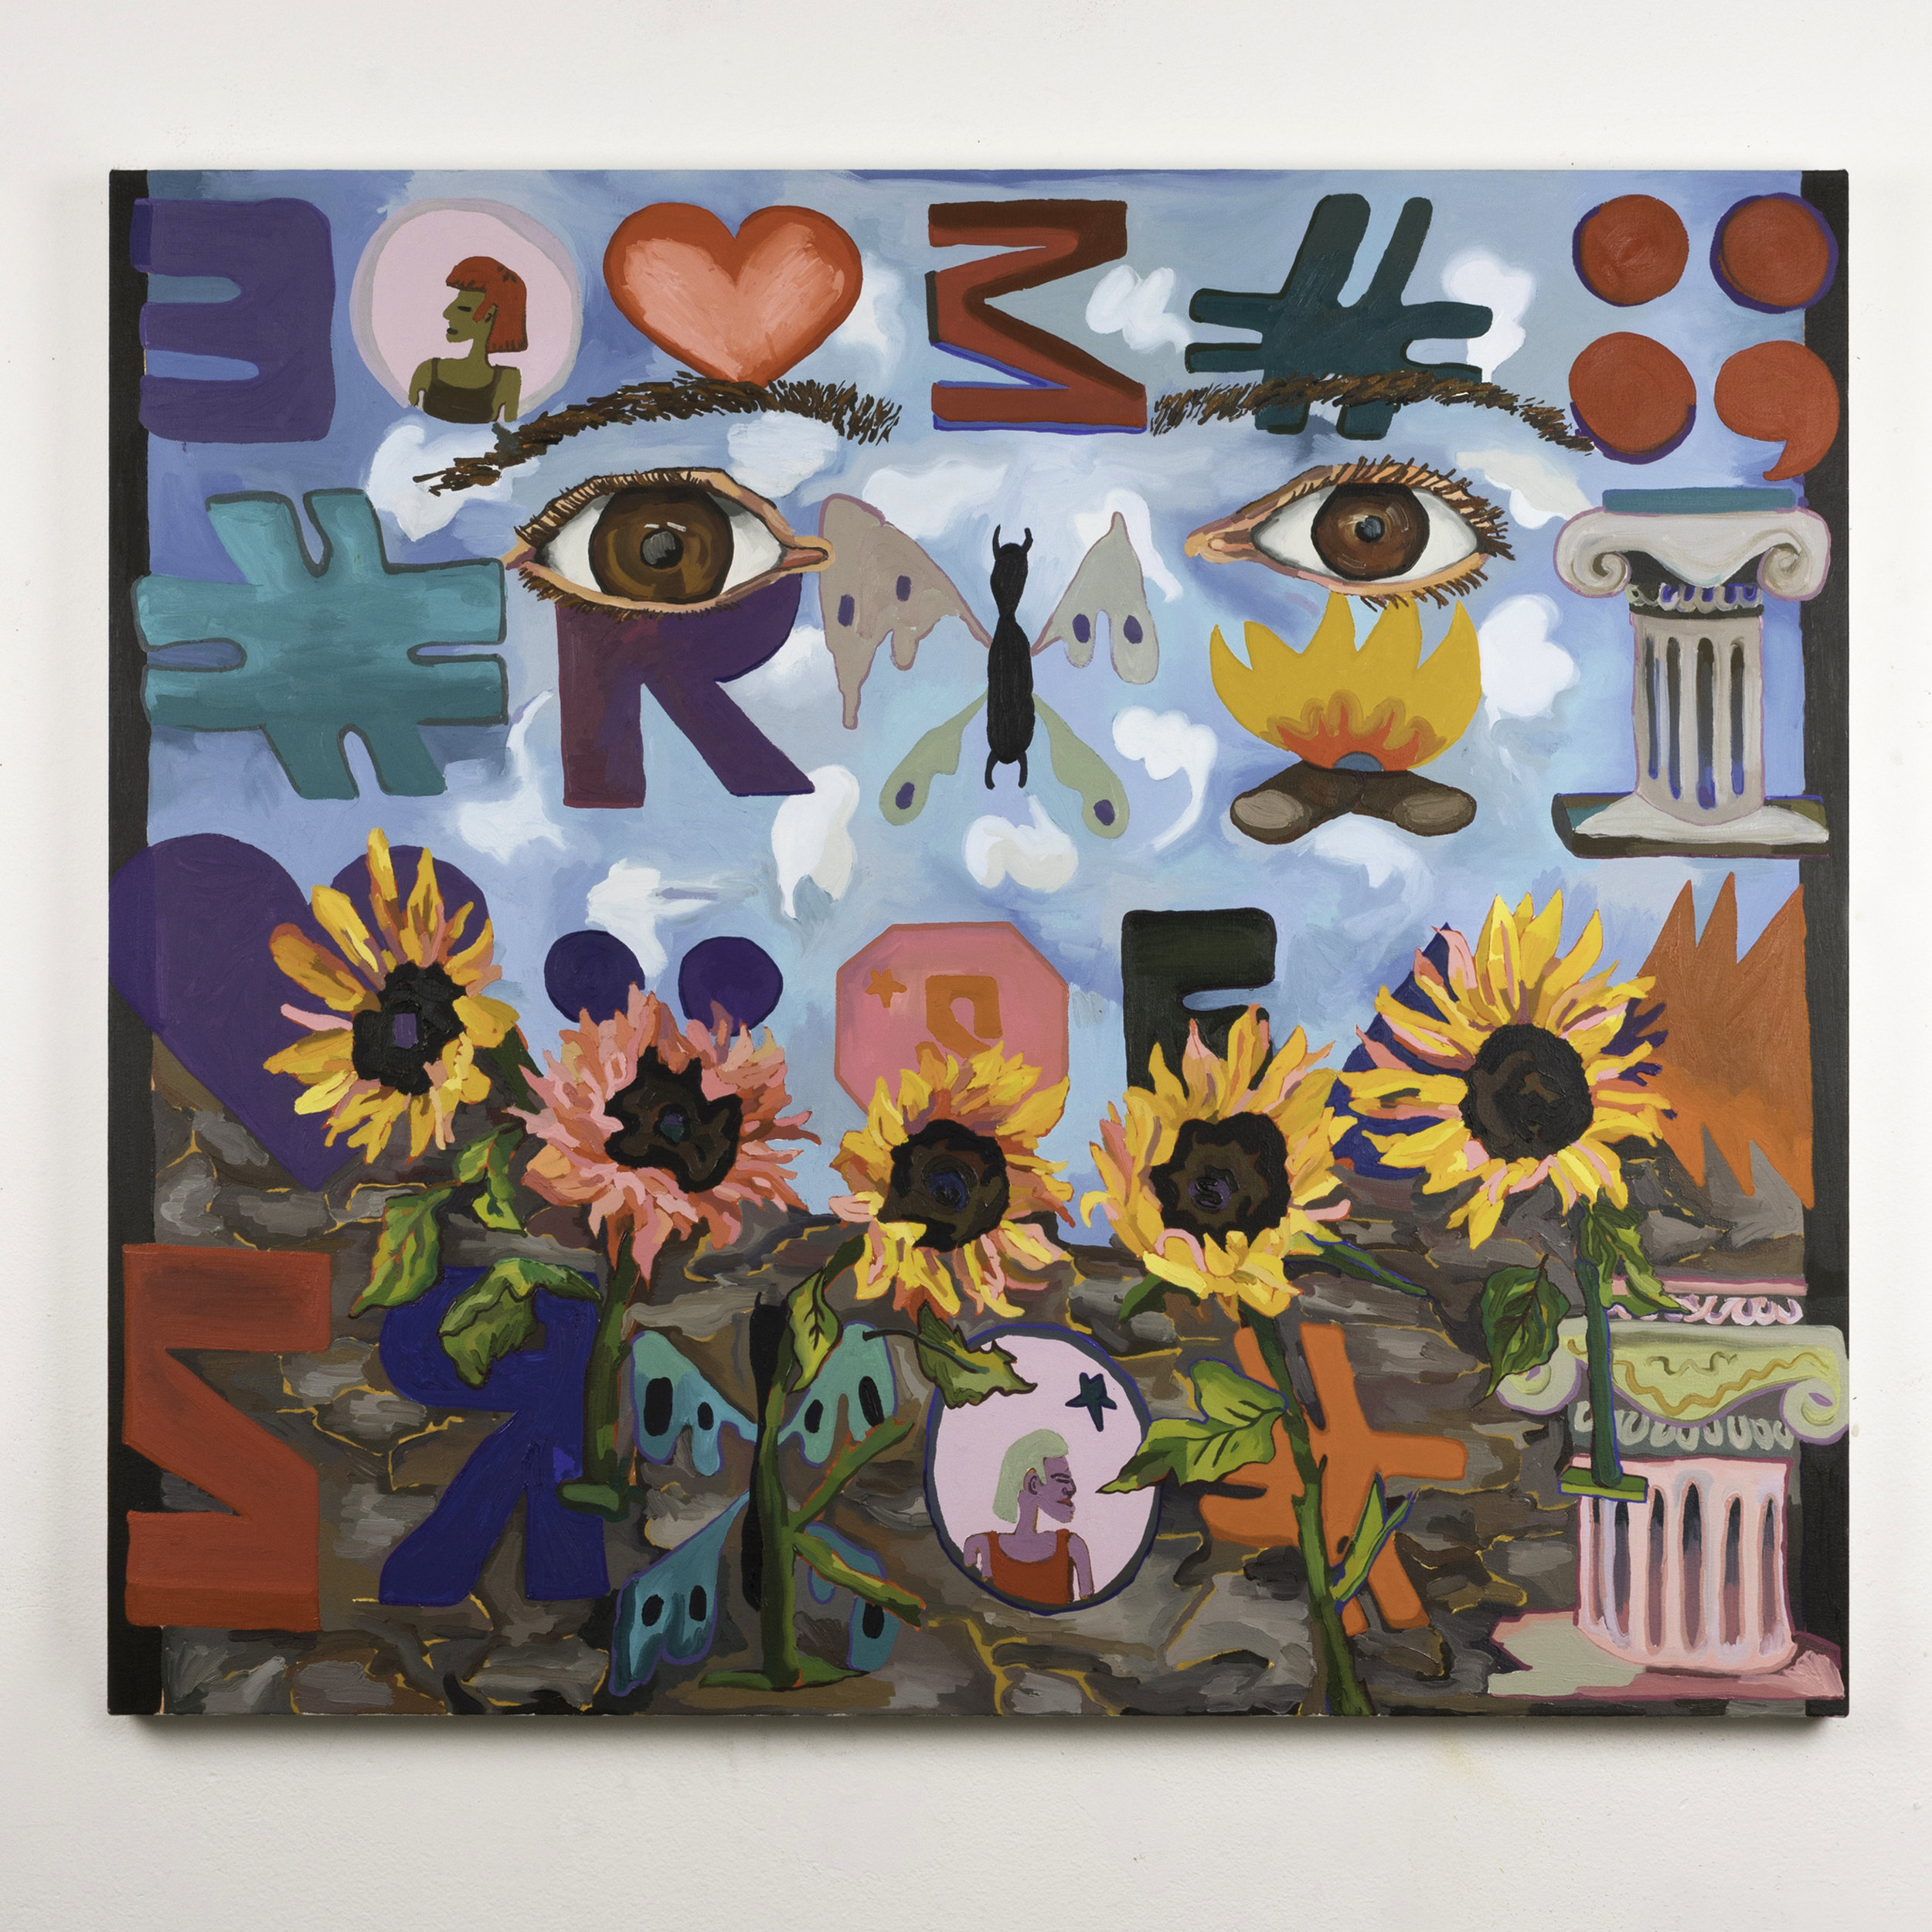 ChA_18_019 - Emoticon, Sunflowers, Eyes (high resolution).jpg